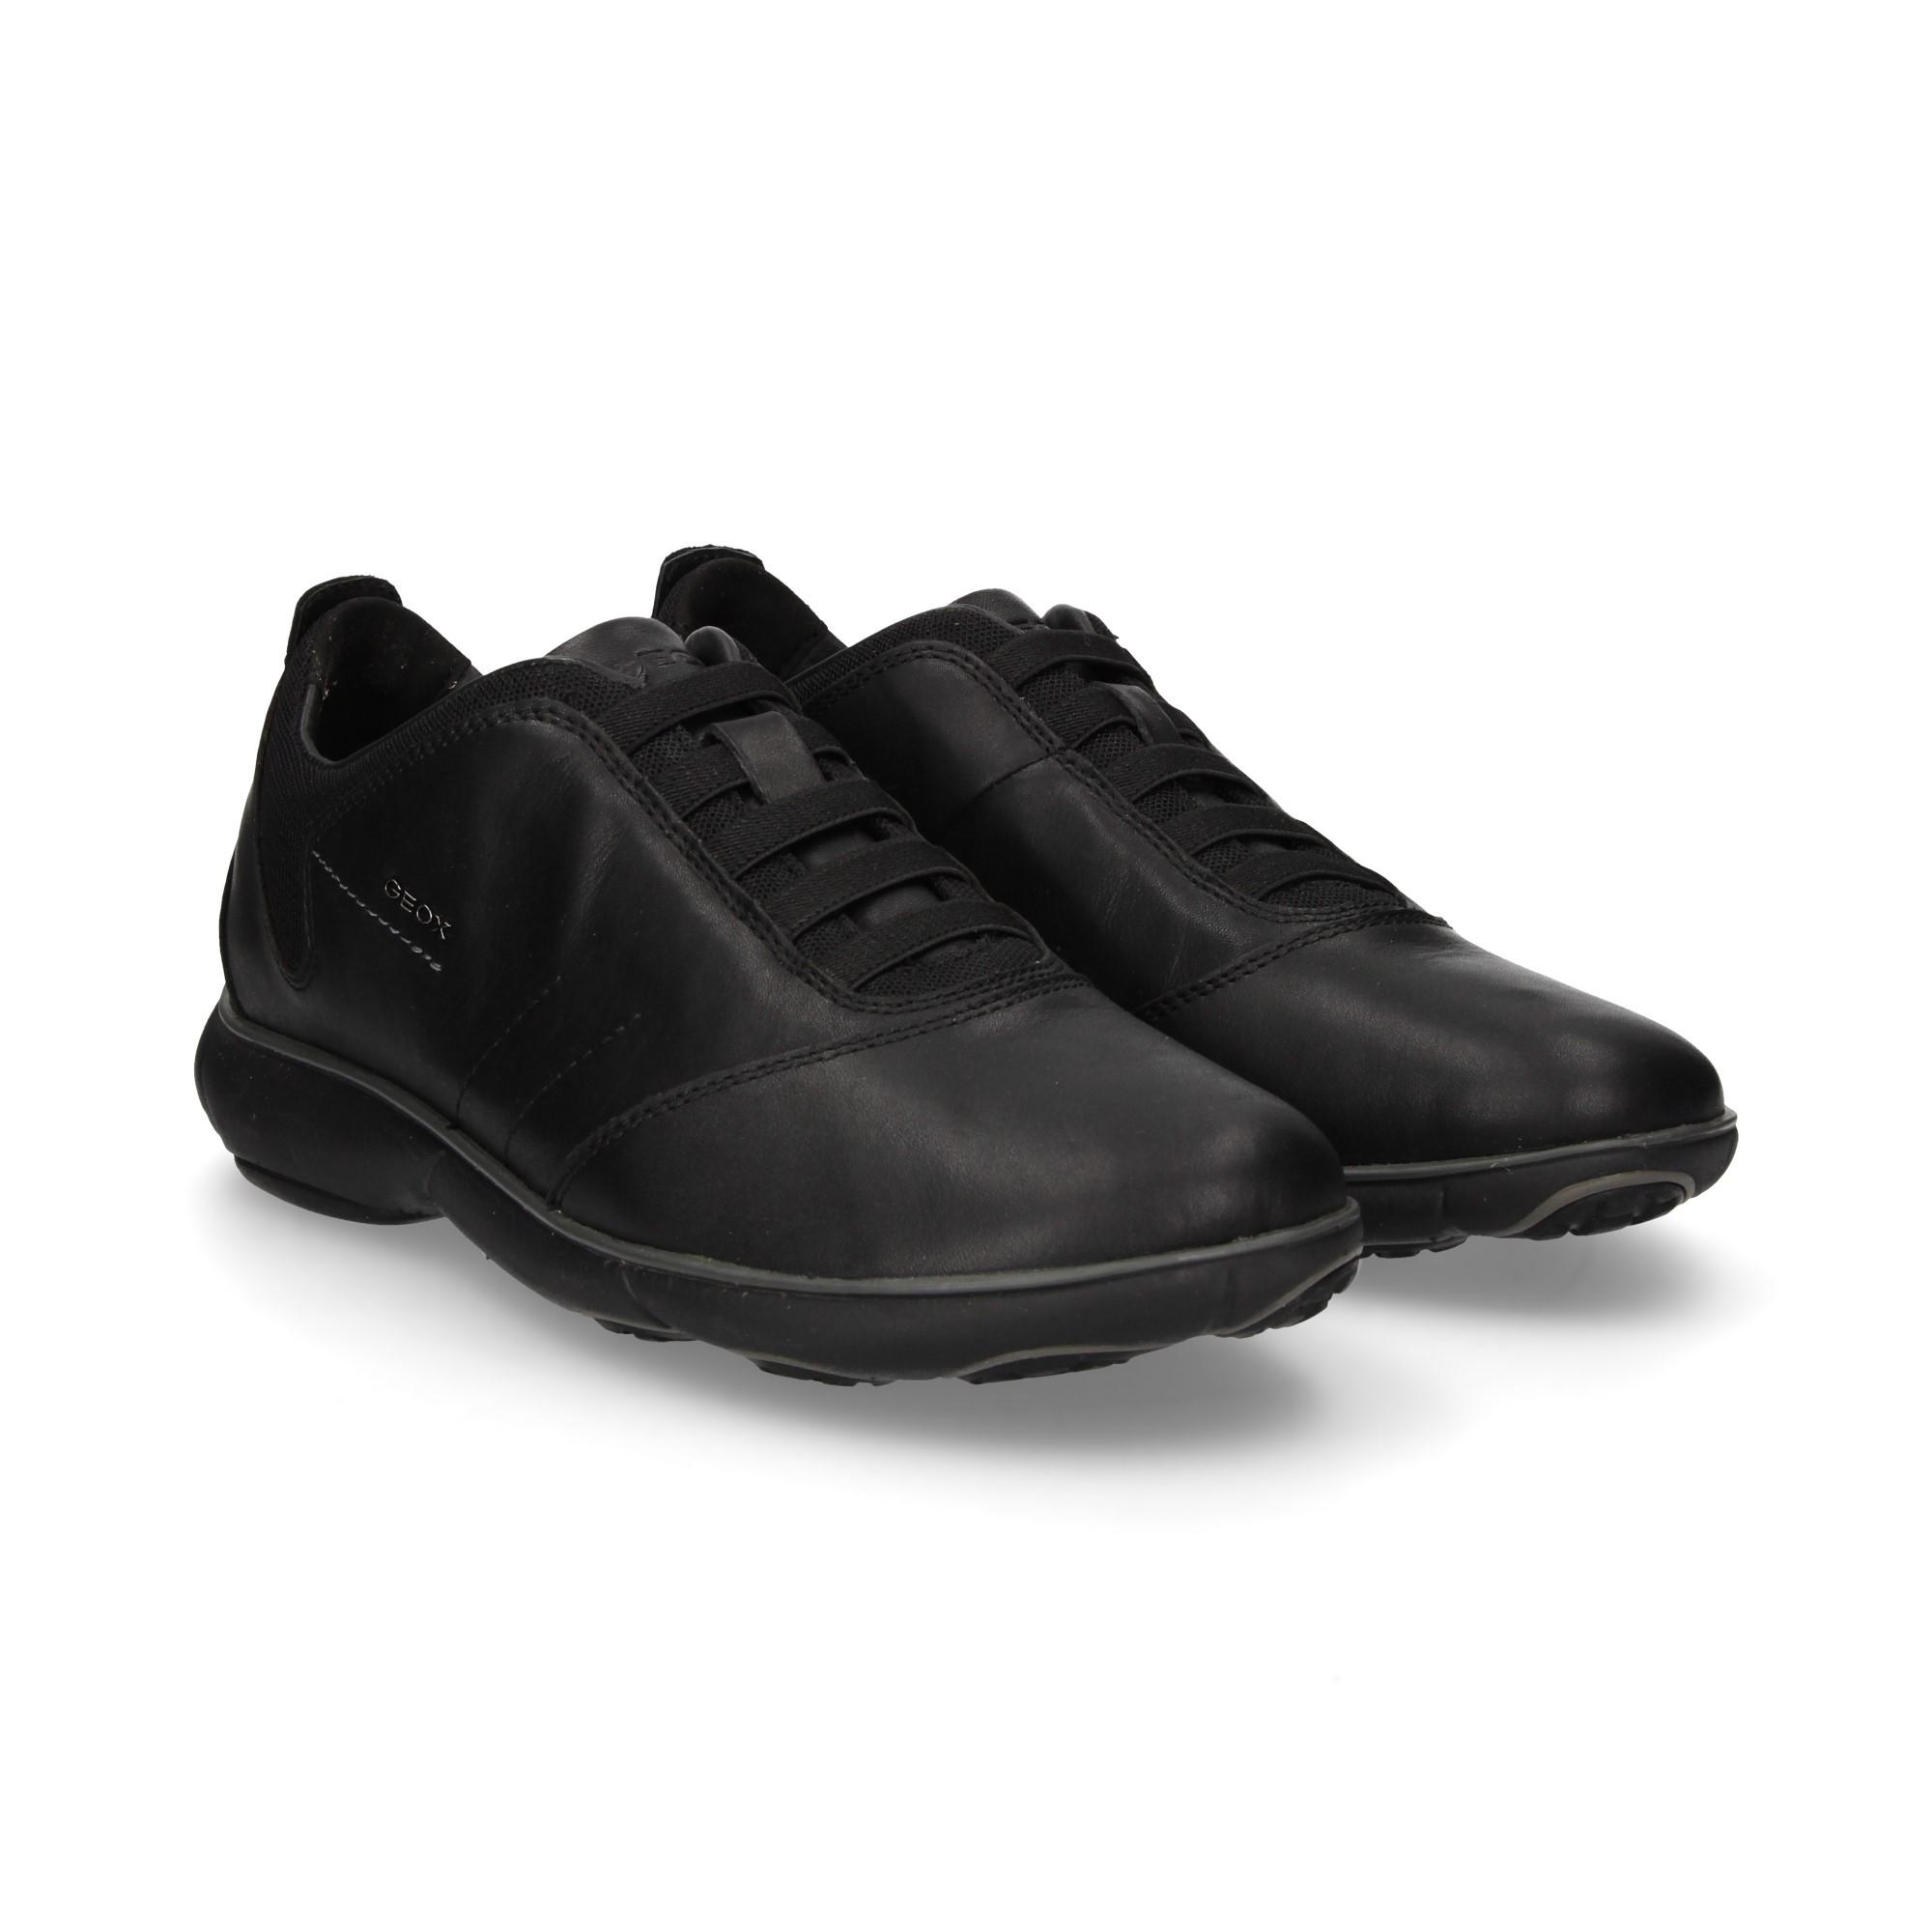 c9bd11f4ecc GEOX Men's sneakers U52D7B C9999 NEGRO